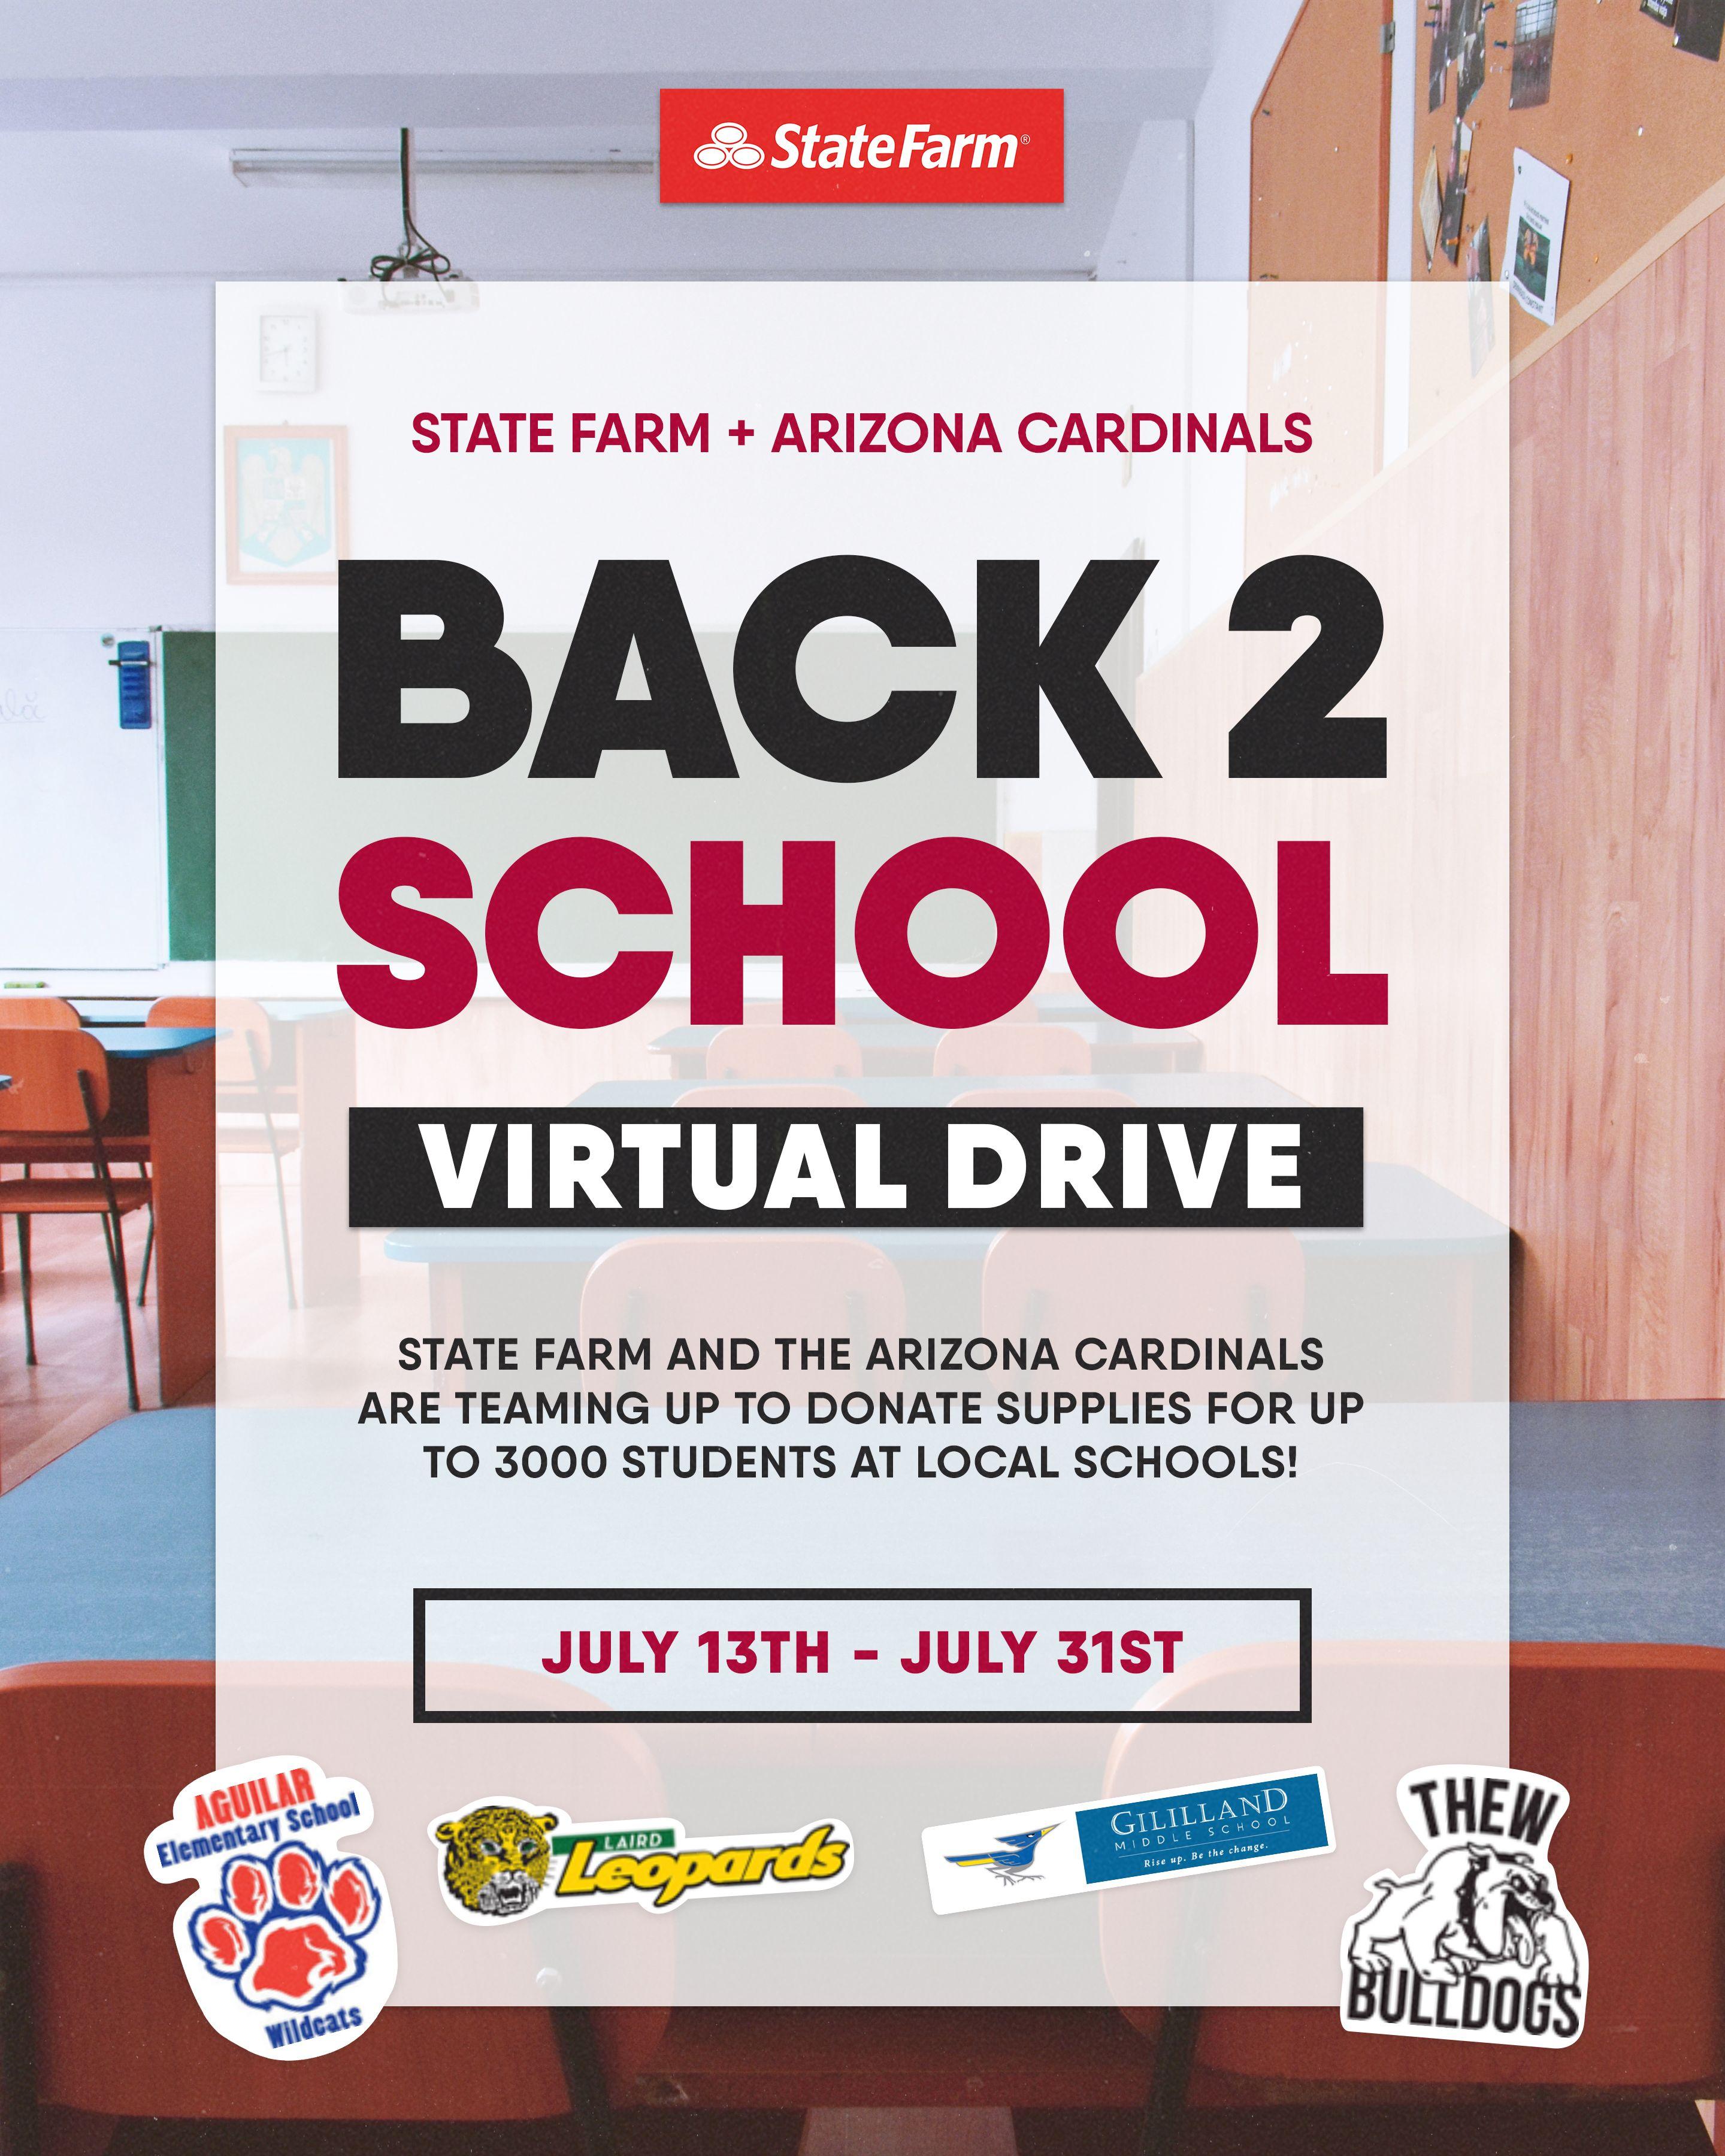 Back 2 School Virtual Drive Through July 31